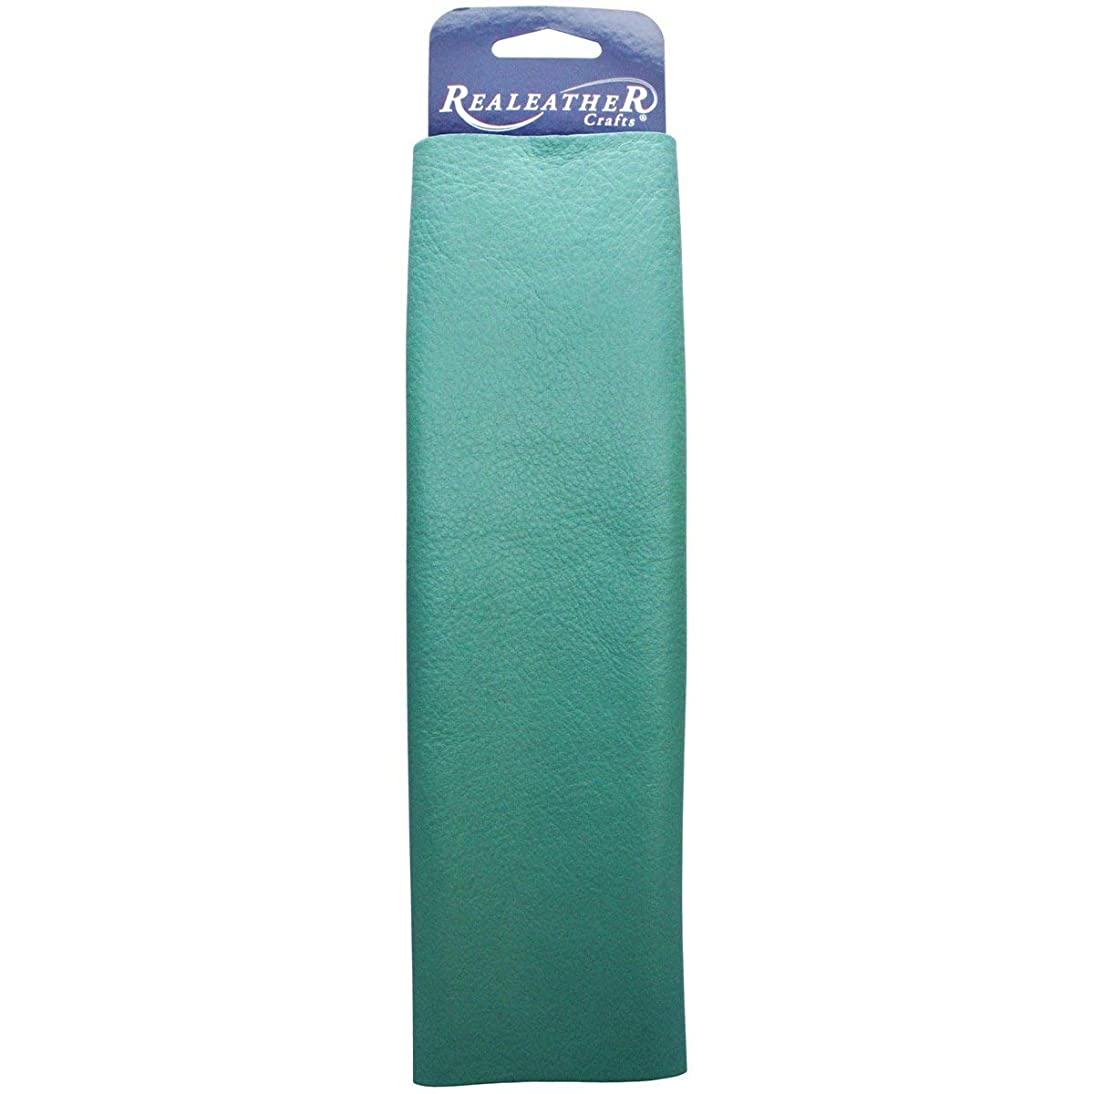 SILVER CREEK LEATHER CO  LLC C0811-04 C0811-04 Premium Trim Leather 8.5X11 Turquoise wuke559302196388